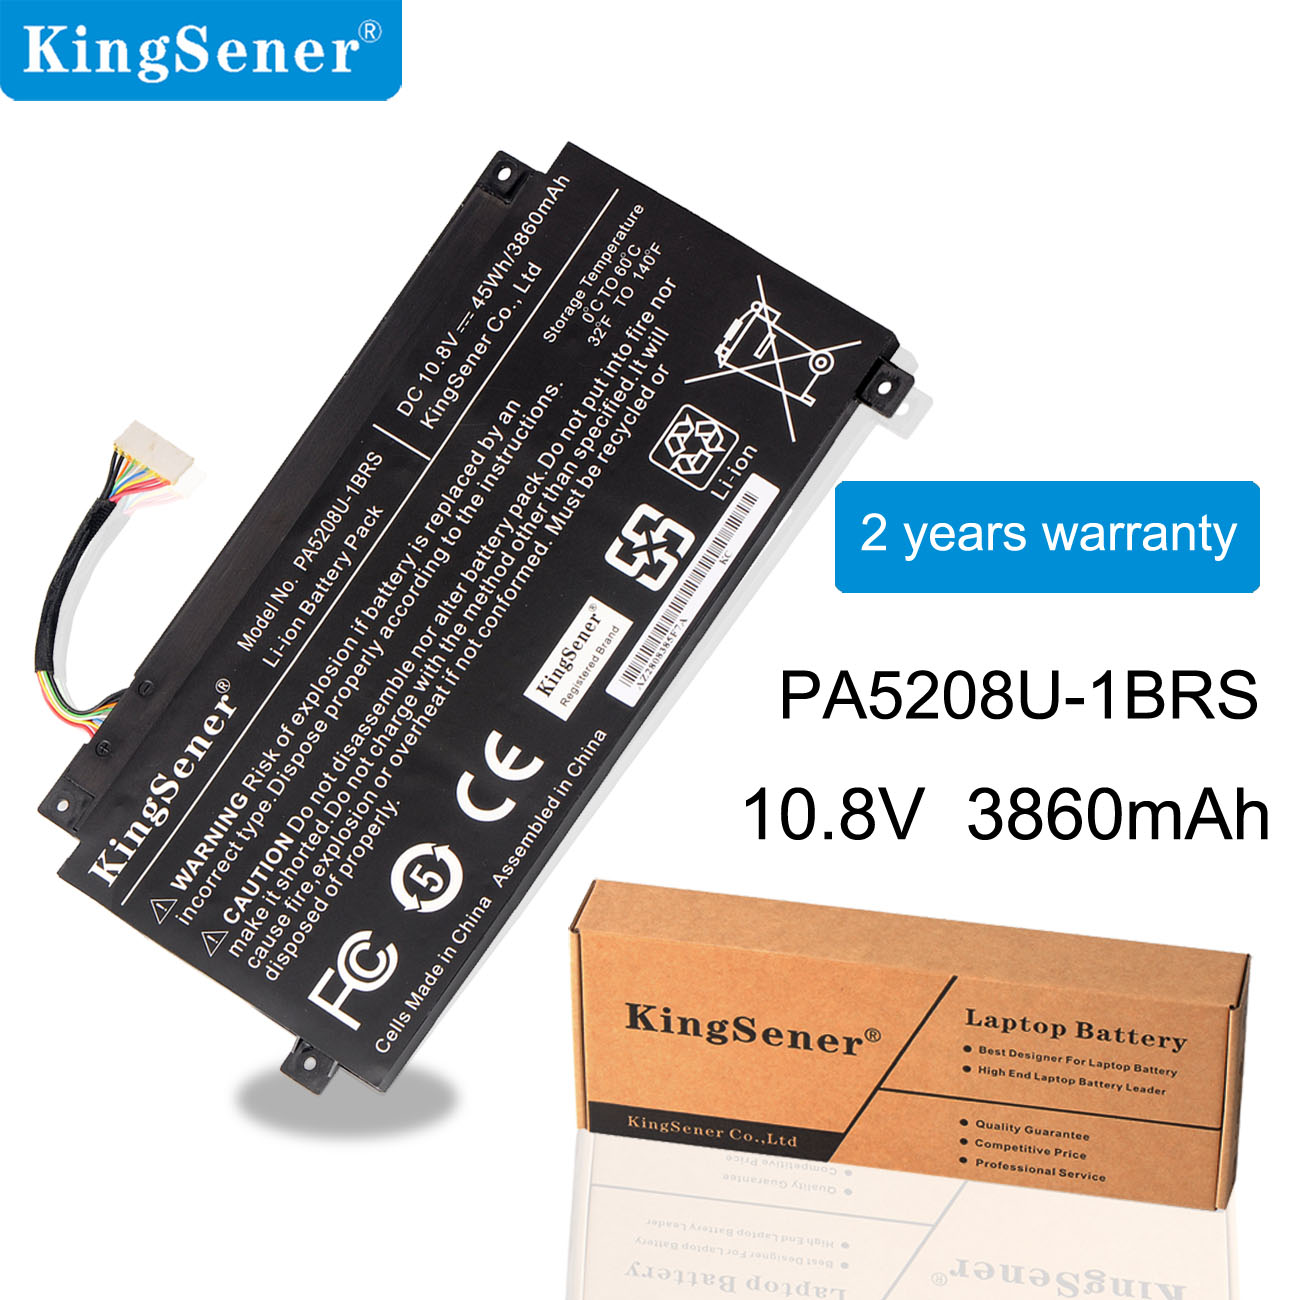 Аккумулятор KingSener PA5208U-1BRS PA5208U, для Toshiba Chromebook CB30 CB35, CB35-B3340, для Satellite E45W P55W, CB35-B3330, L55